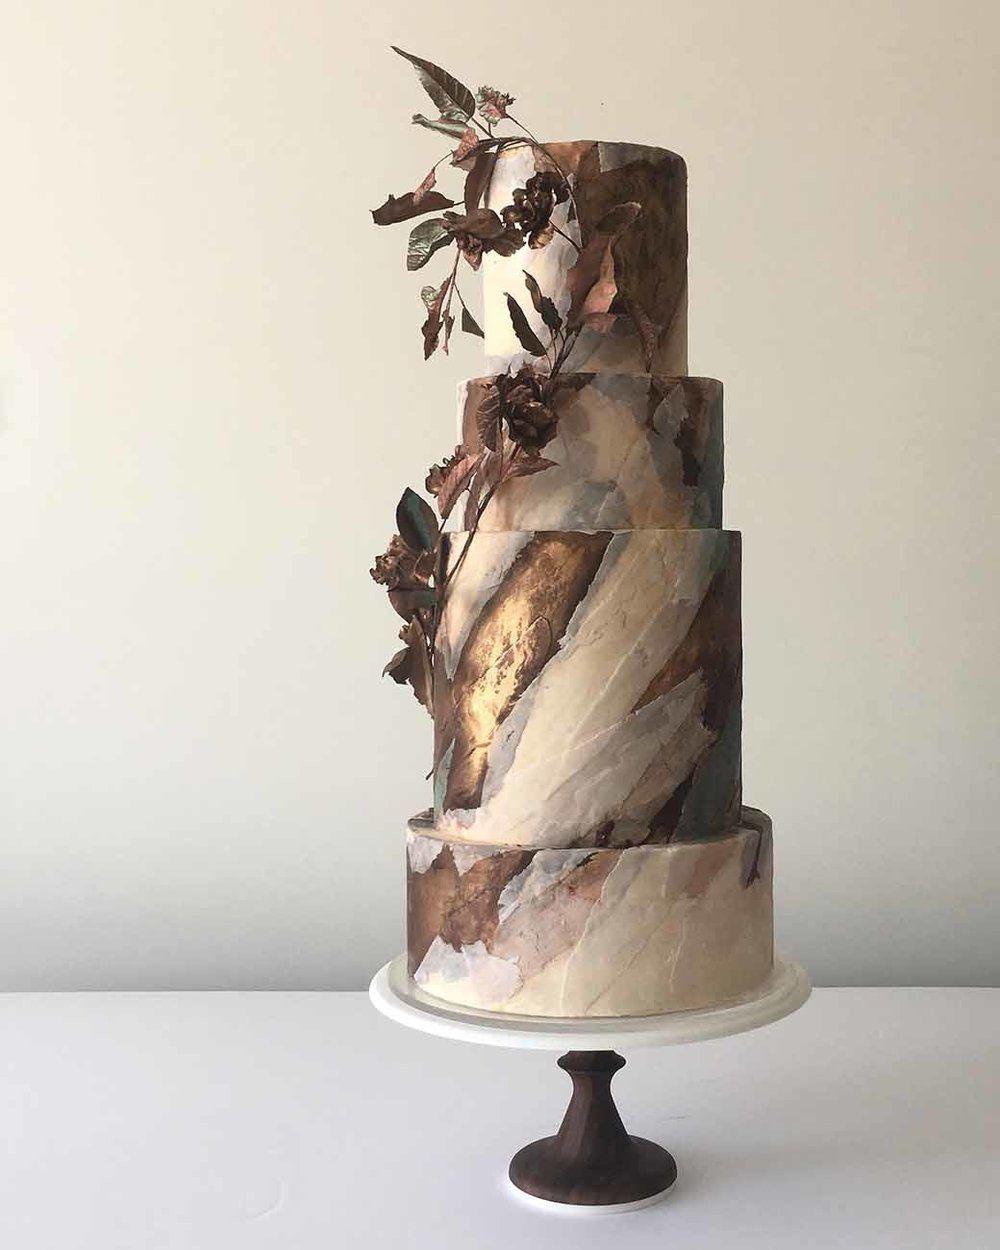 portfolio | Cake Designs | Pinterest | Cake, Wedding cake and ...